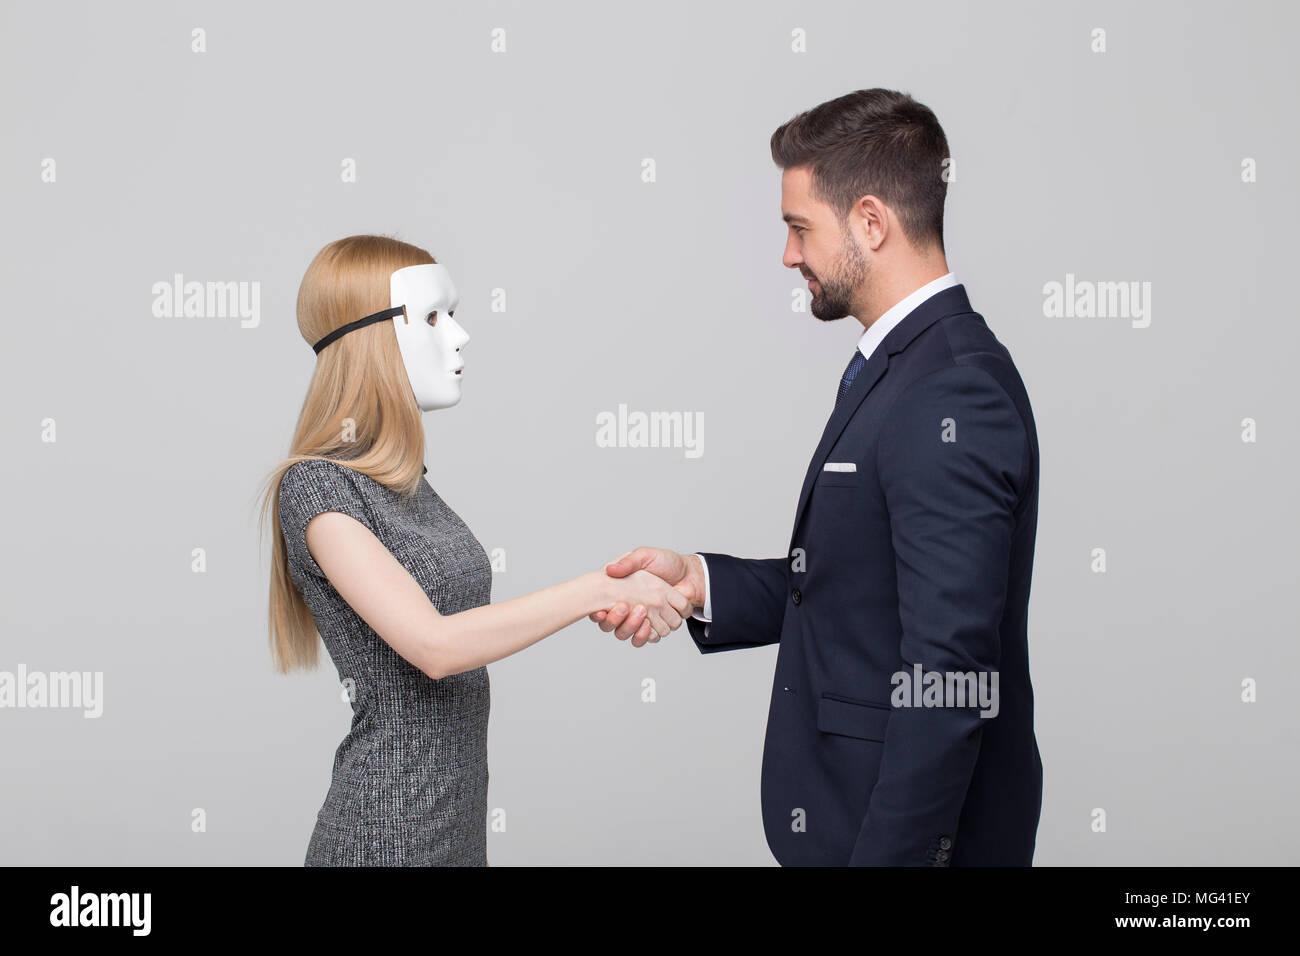 Singles london dating